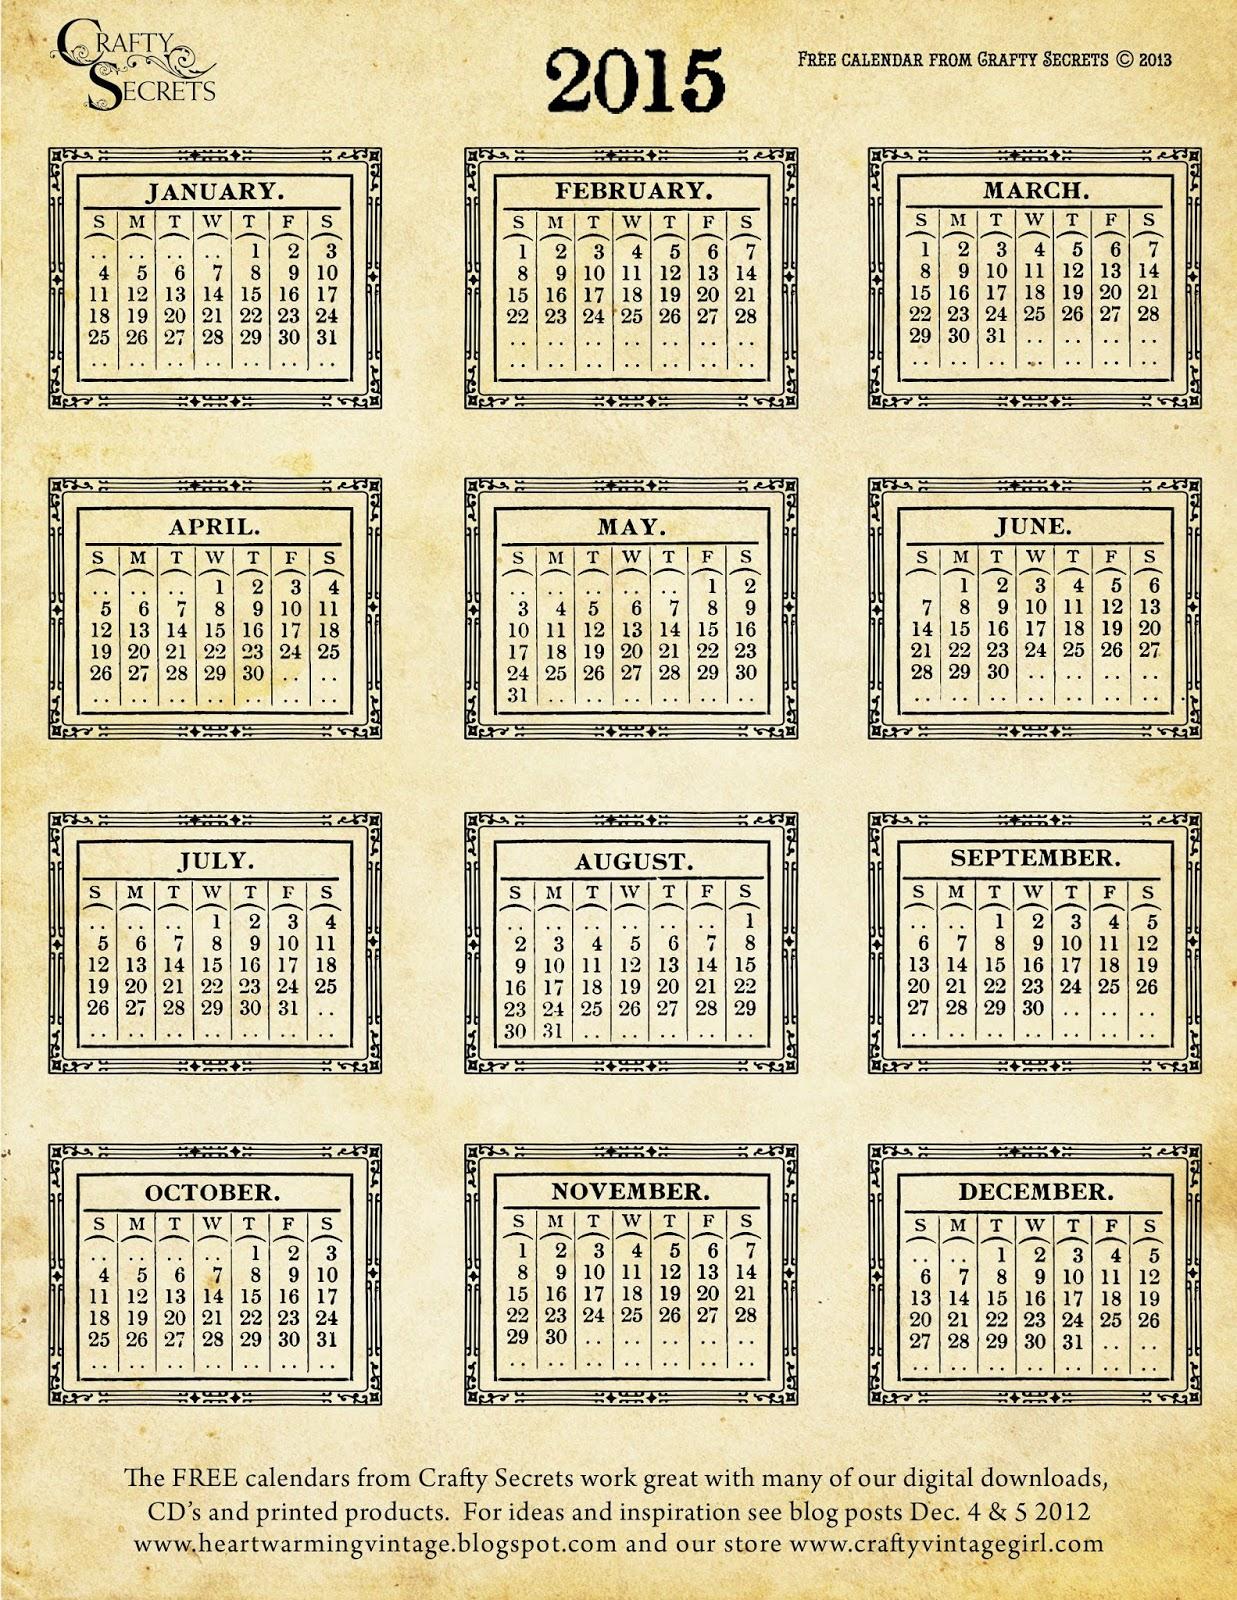 Calendar Craft 2015 : Crafty secrets heartwarming vintage ideas and tips our